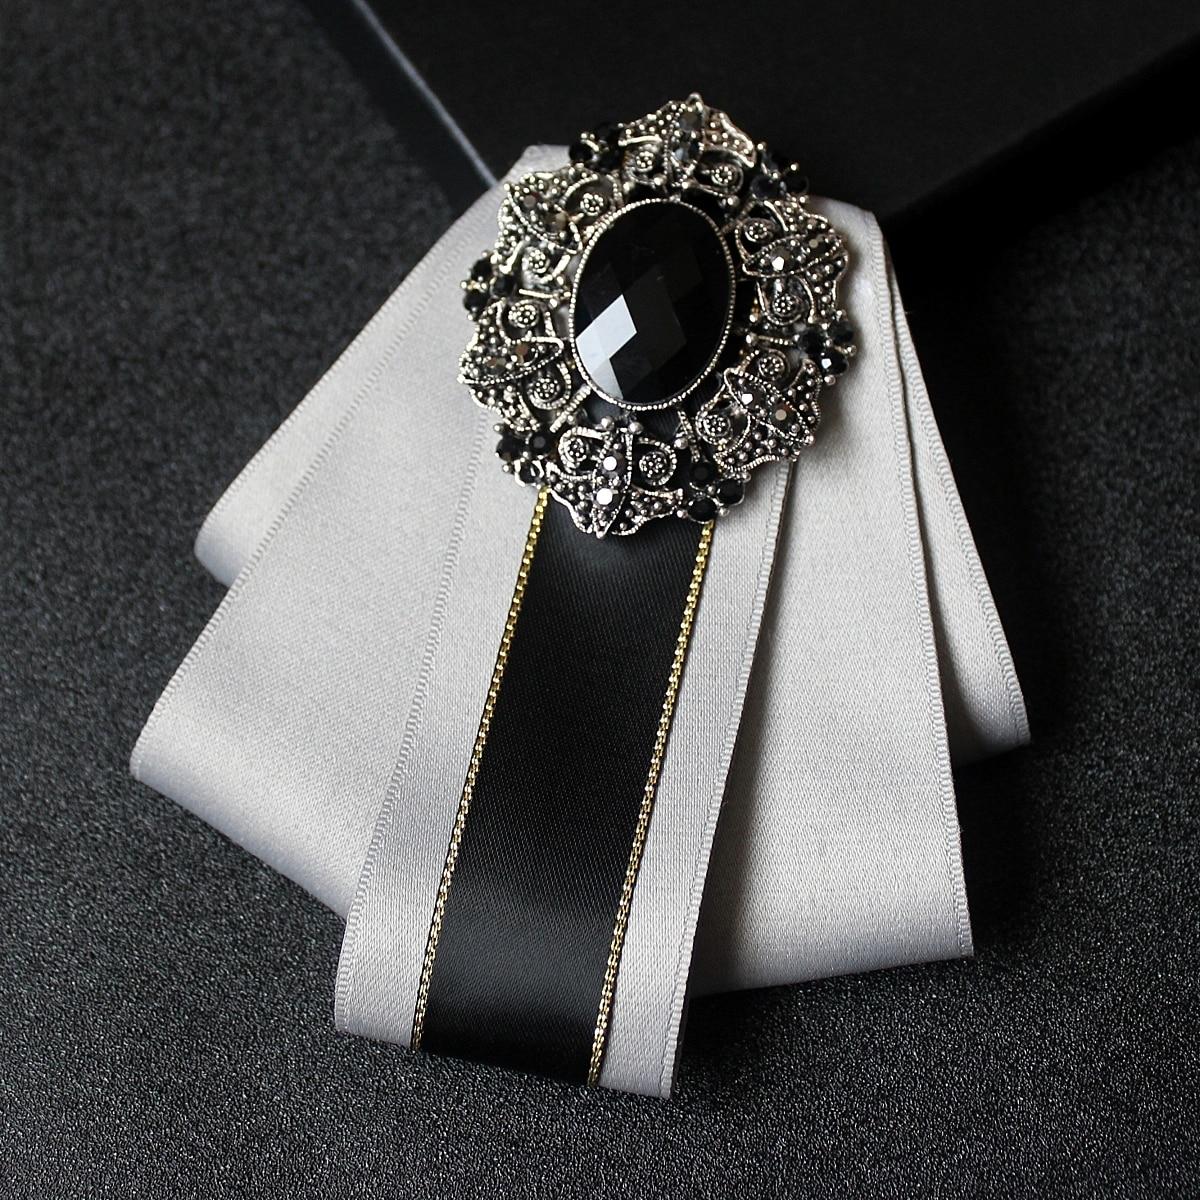 New men's groom groomsmen dress shirt gentleman bow tie High quality diamond business men's party bow tie